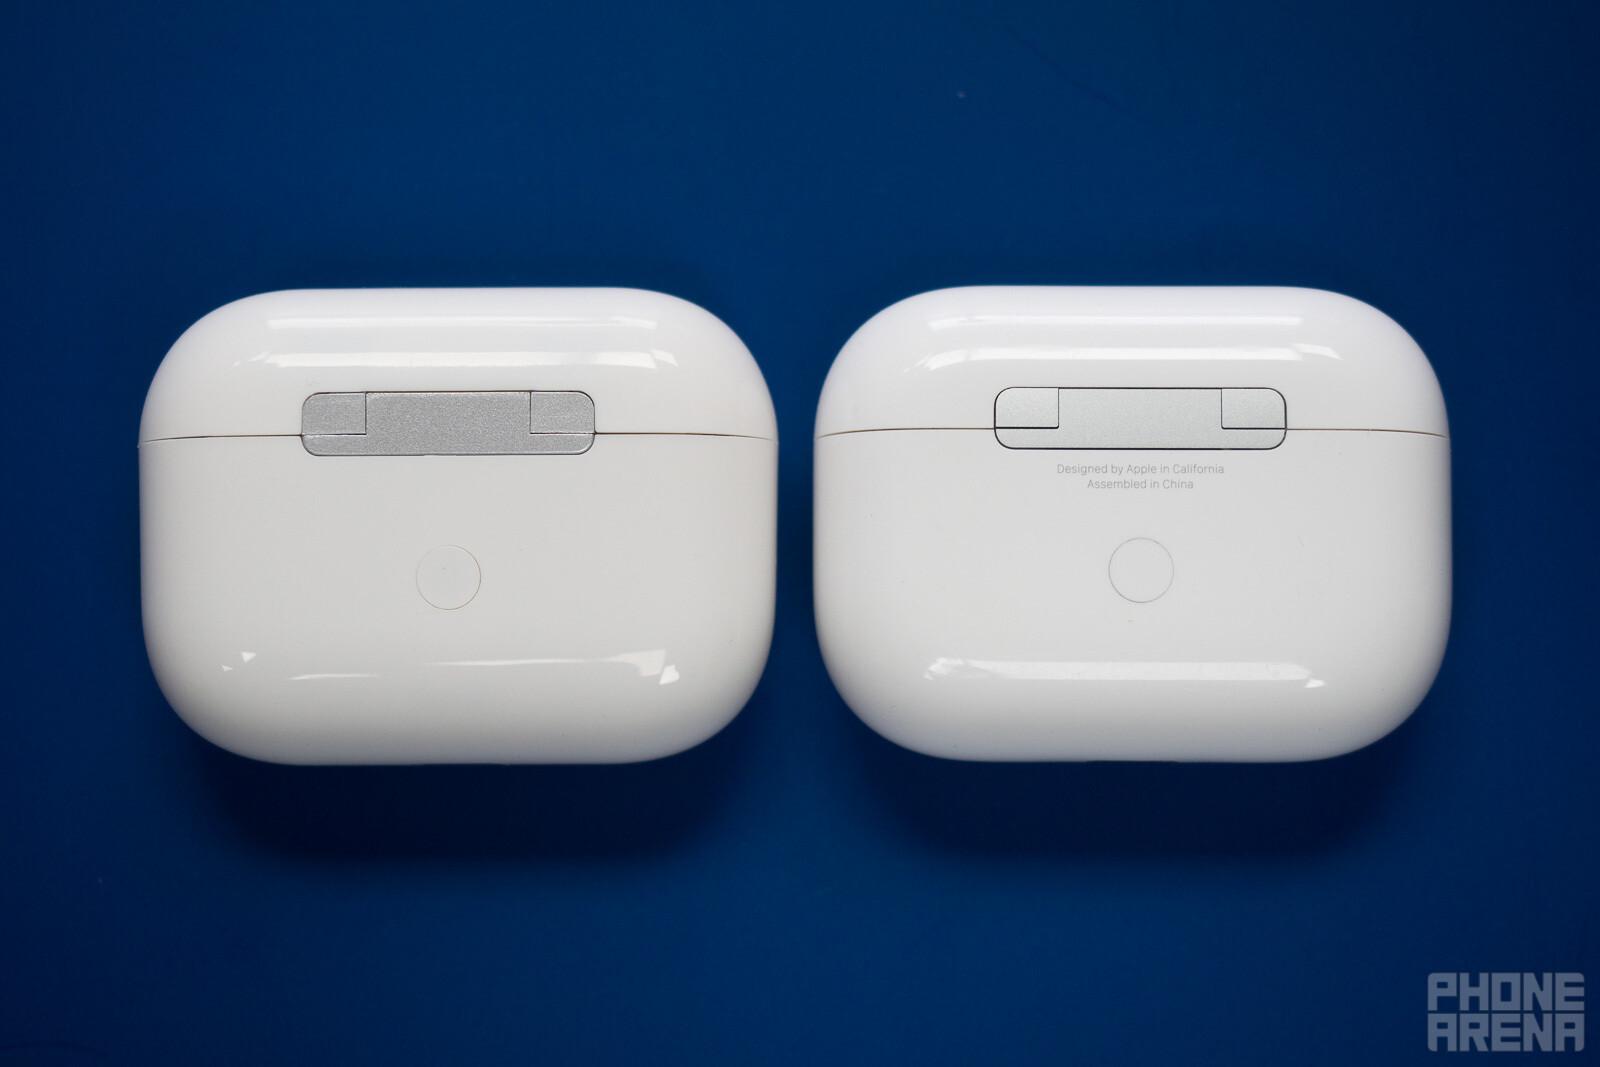 Real AirPods Pro έναντι ψεύτικου AirPods Pro: διαφορές, τρόπος εντοπισμού τους, σύγκριση ποιότητας